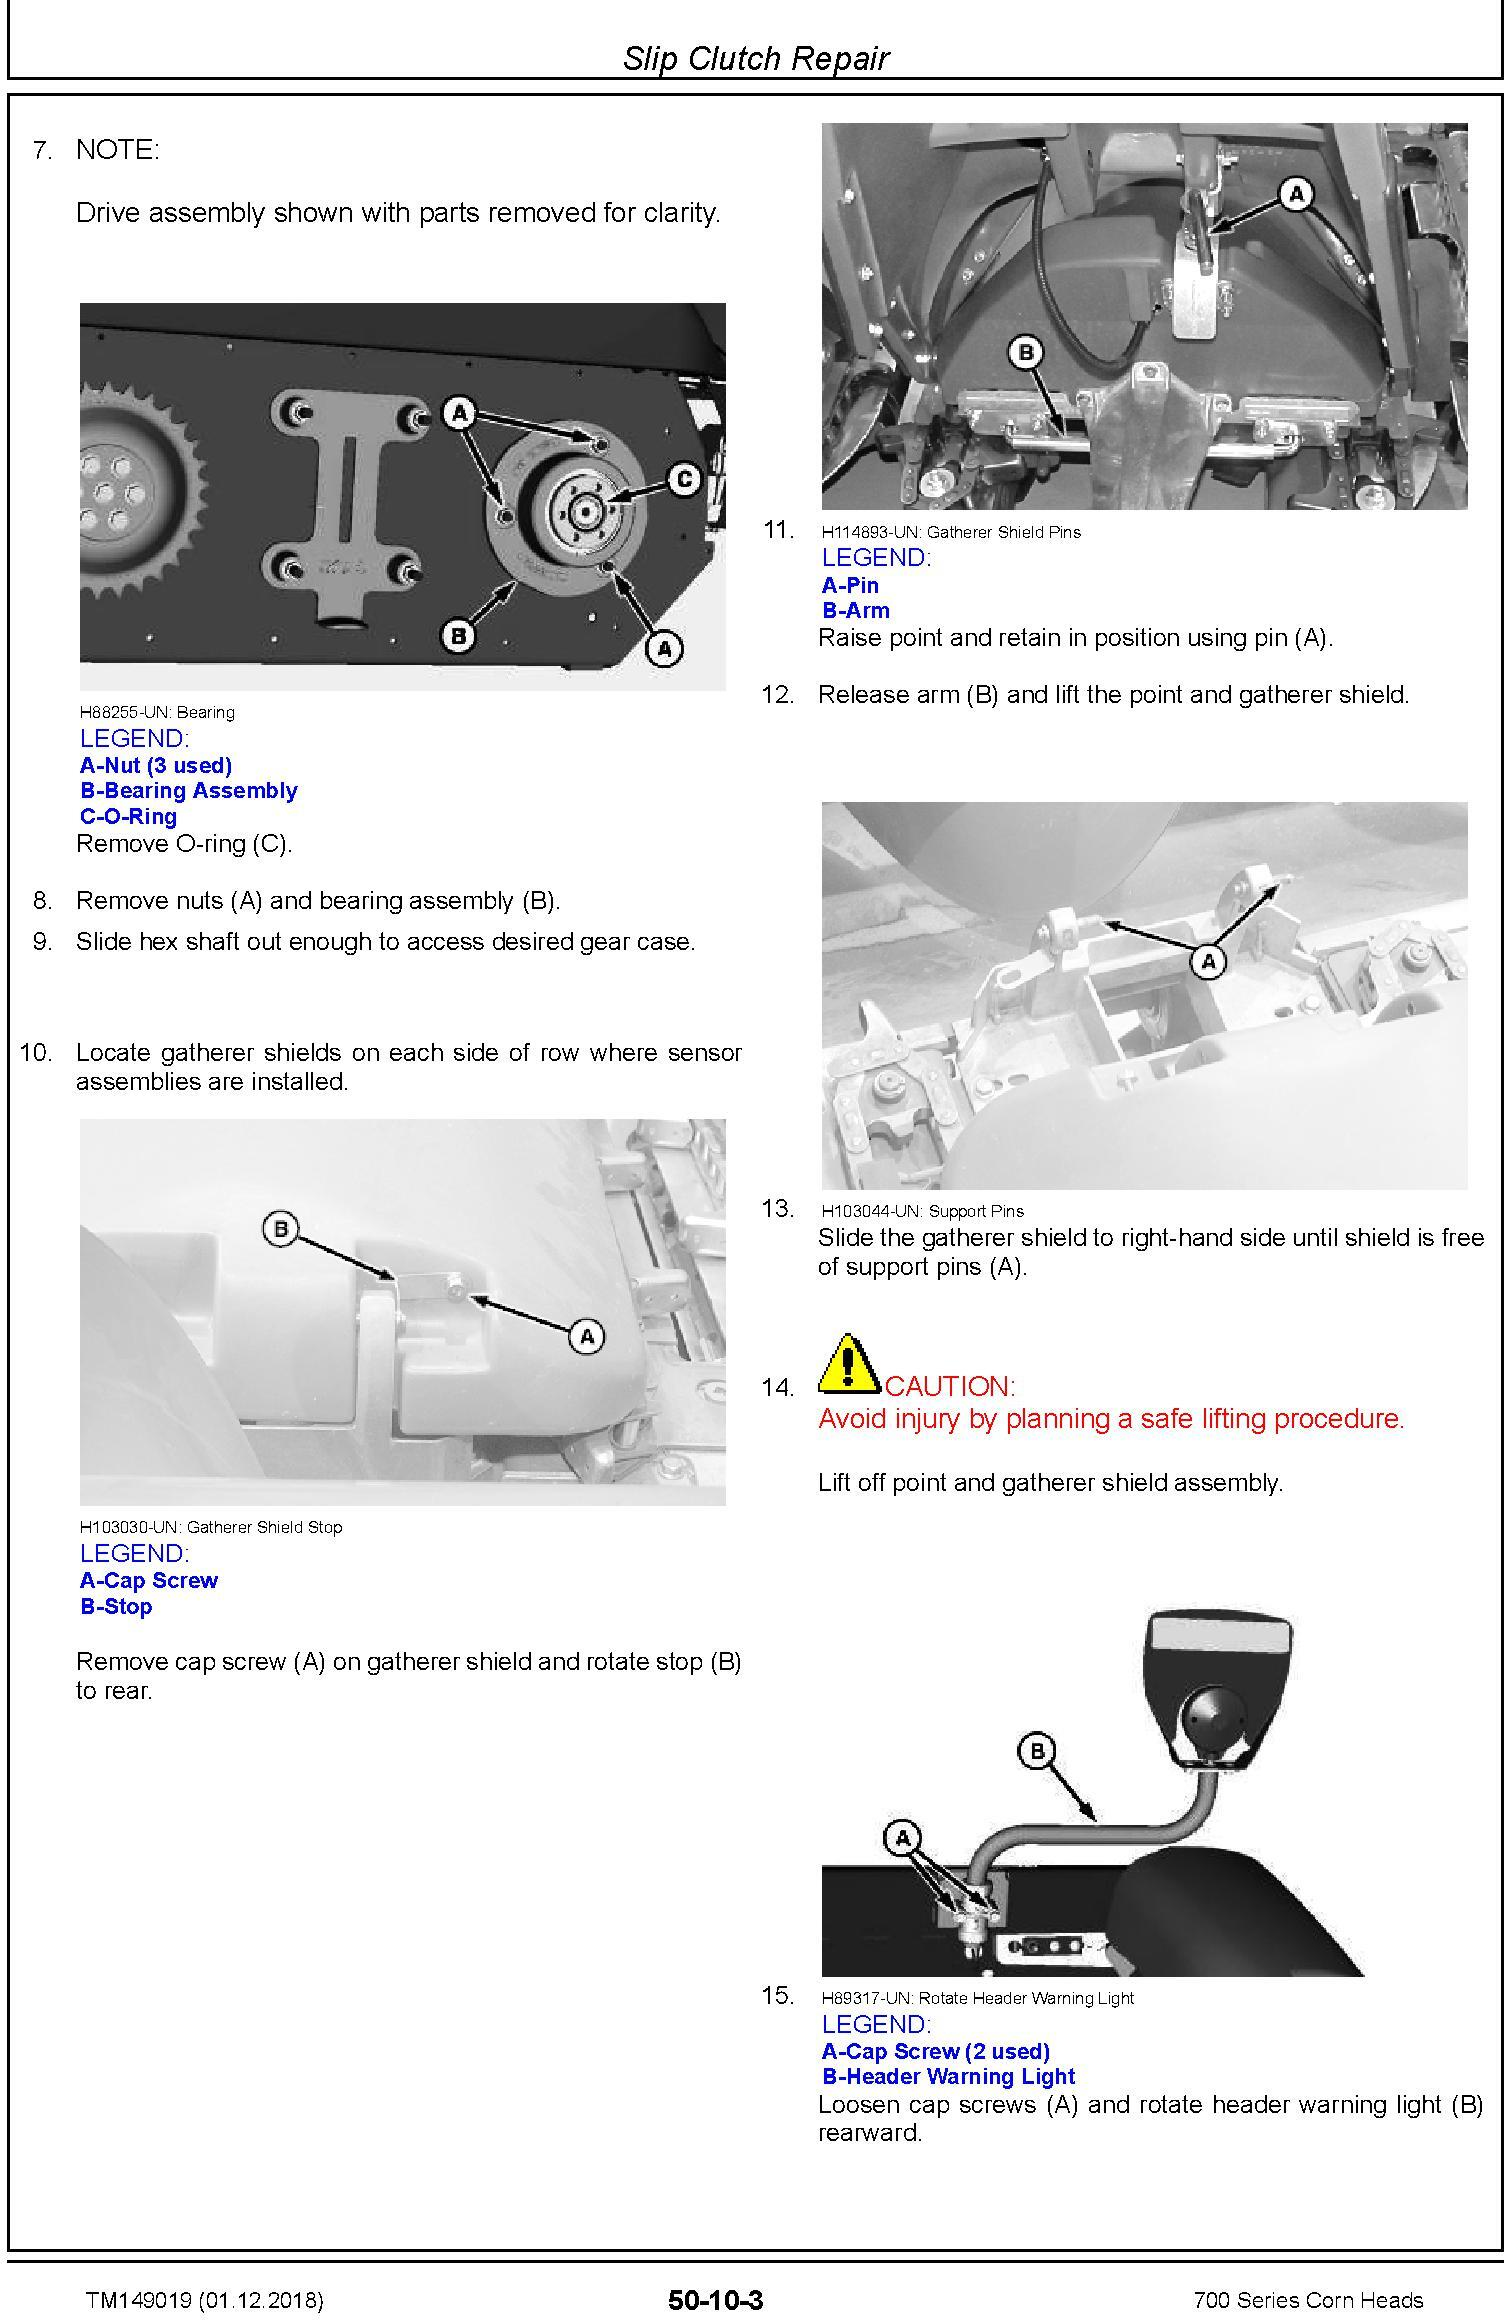 JD John Deere 706C, 708C, 712C, 712FC, 716C, 718C Corn Heads Repair Technical Service Manual (TM149019) - 3